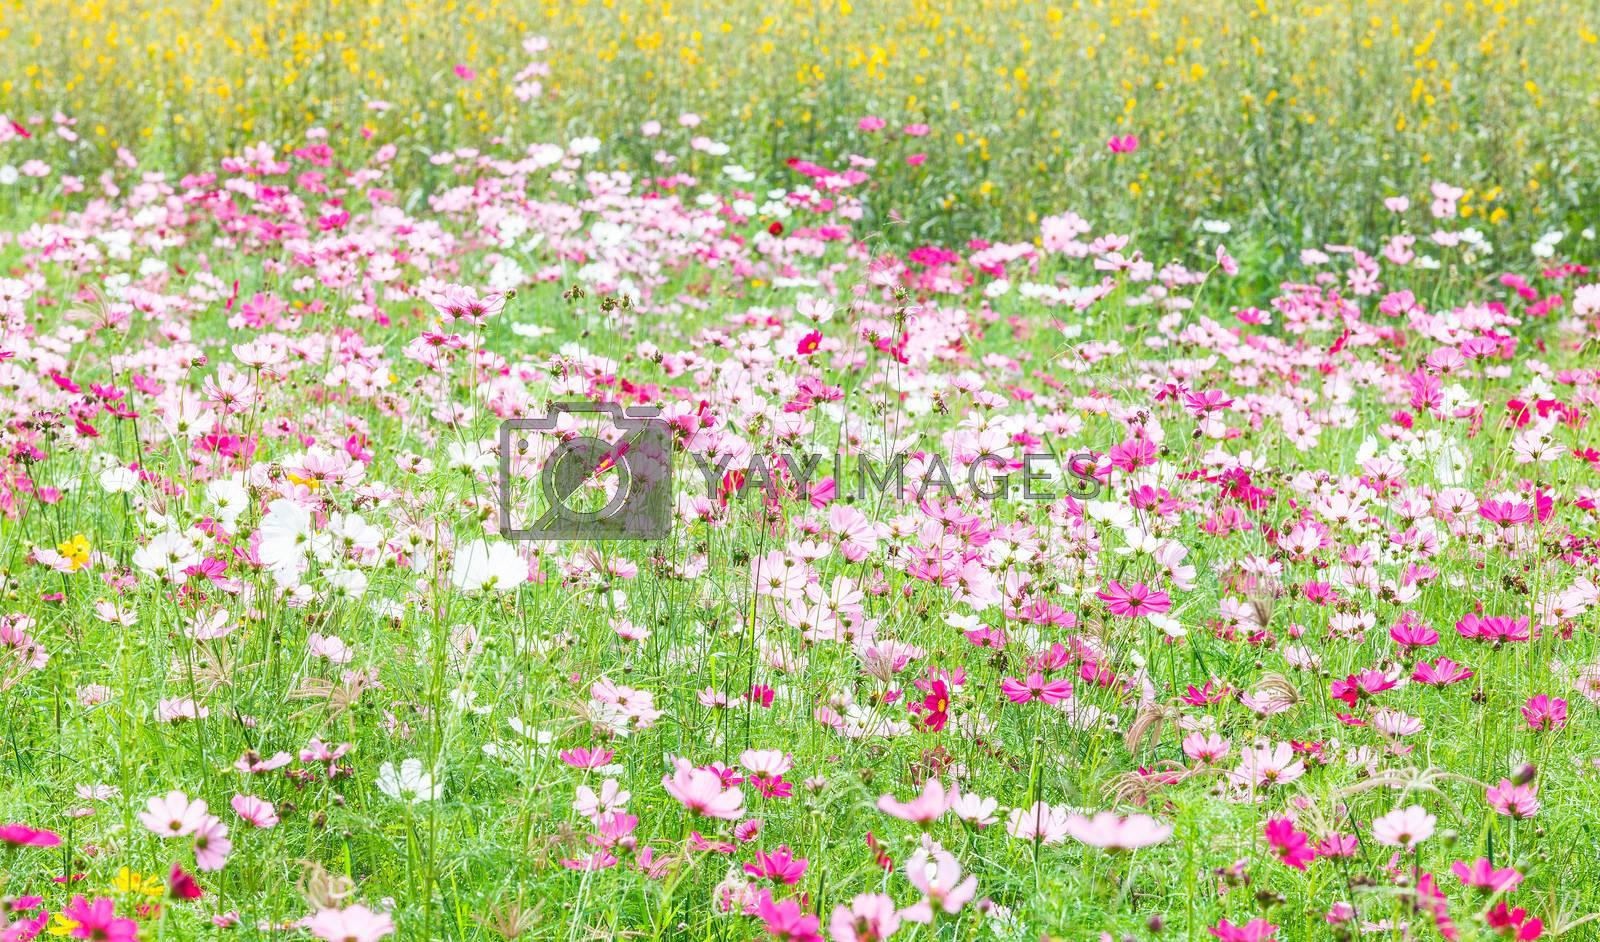 beautiful flowers in the meadow